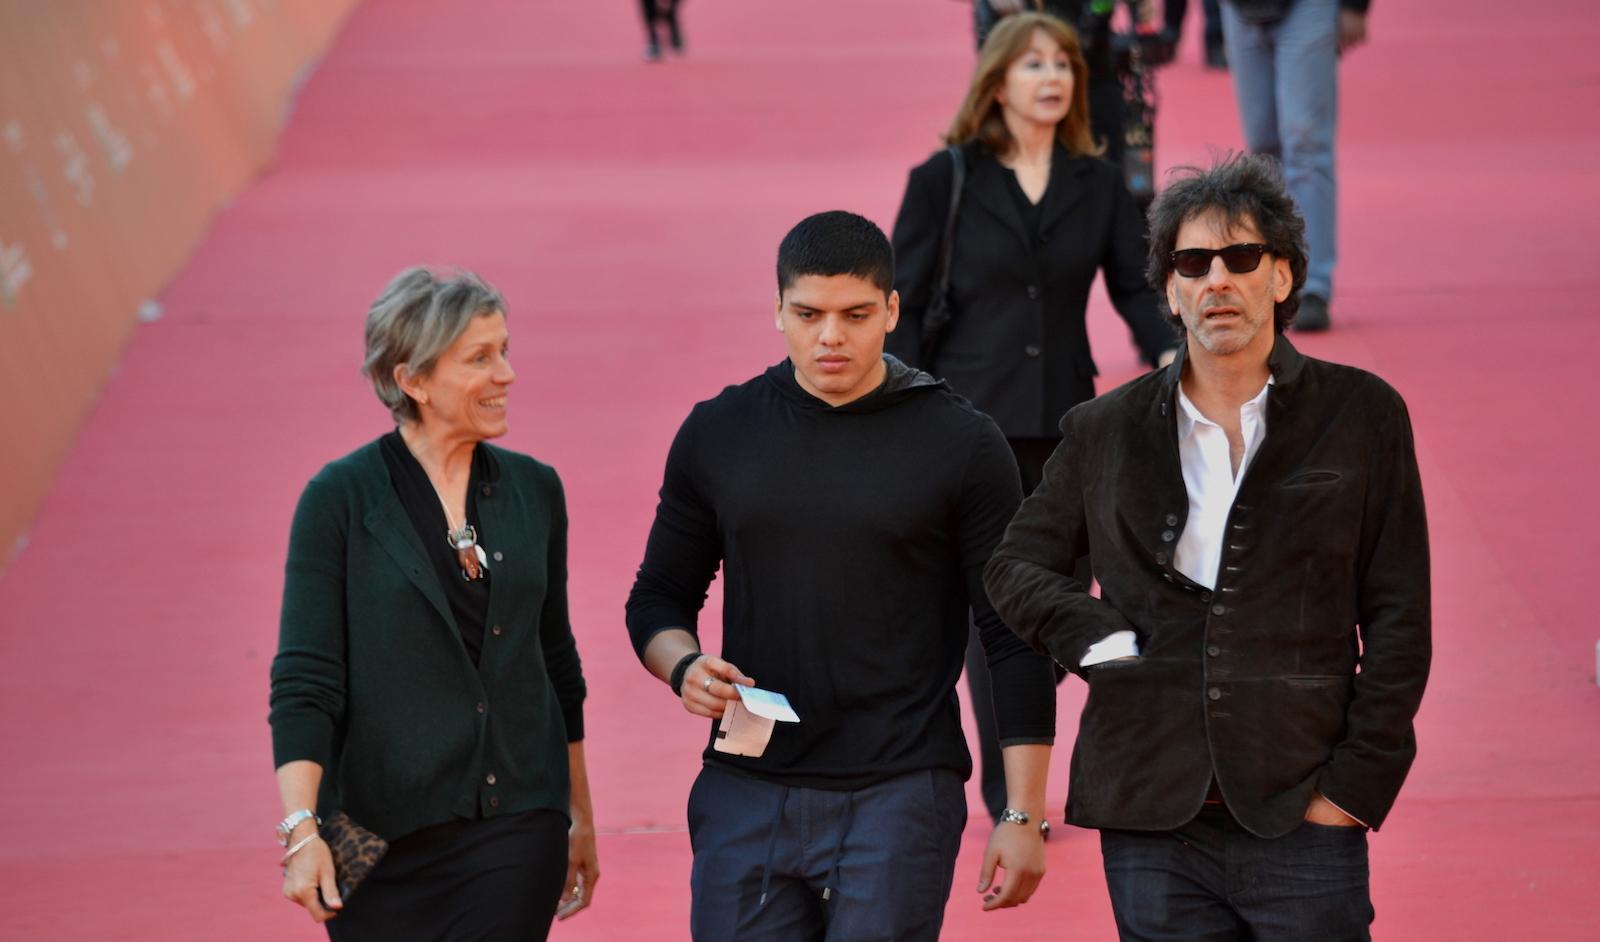 Roma 2015: Joel Coen e Frances McDormand mentre attraversano il red carpet